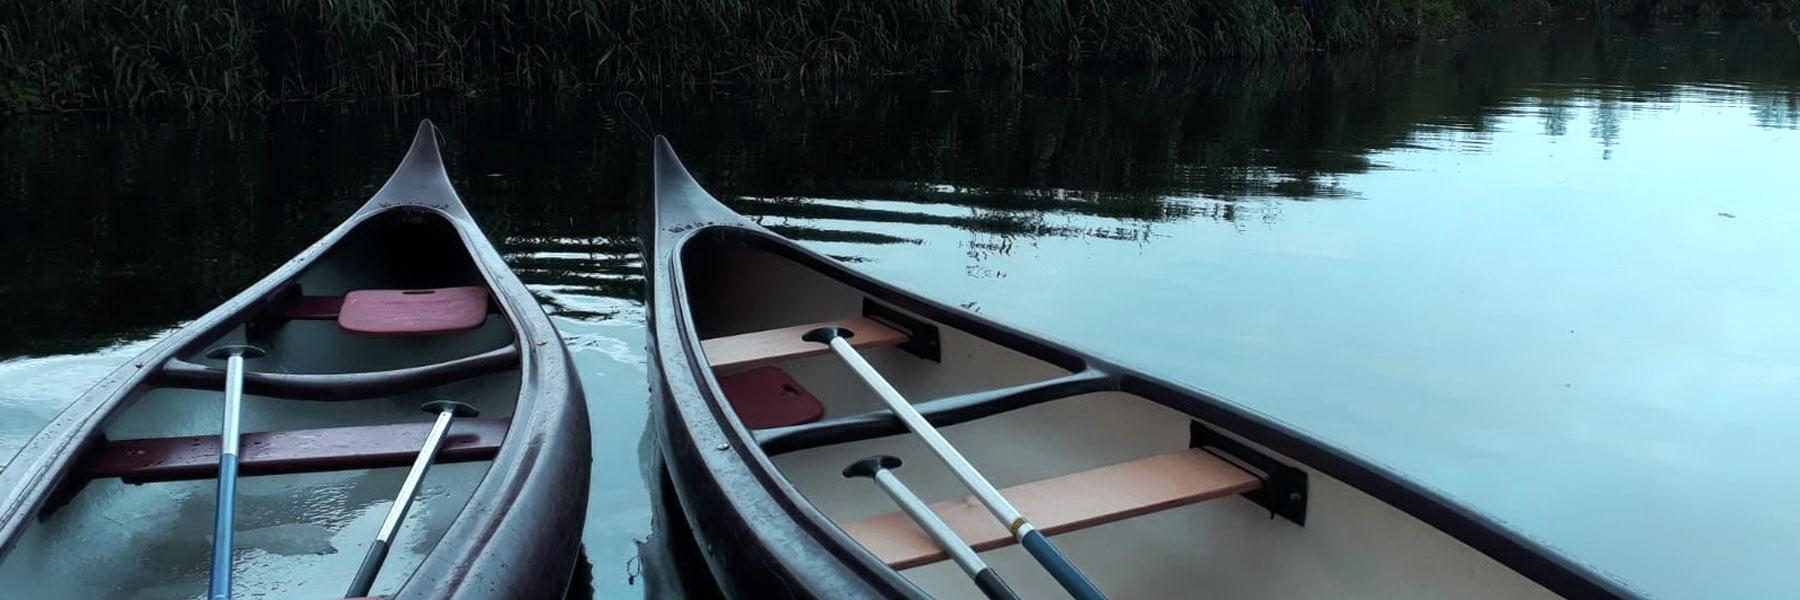 Kanus - Kanustation Klempenow